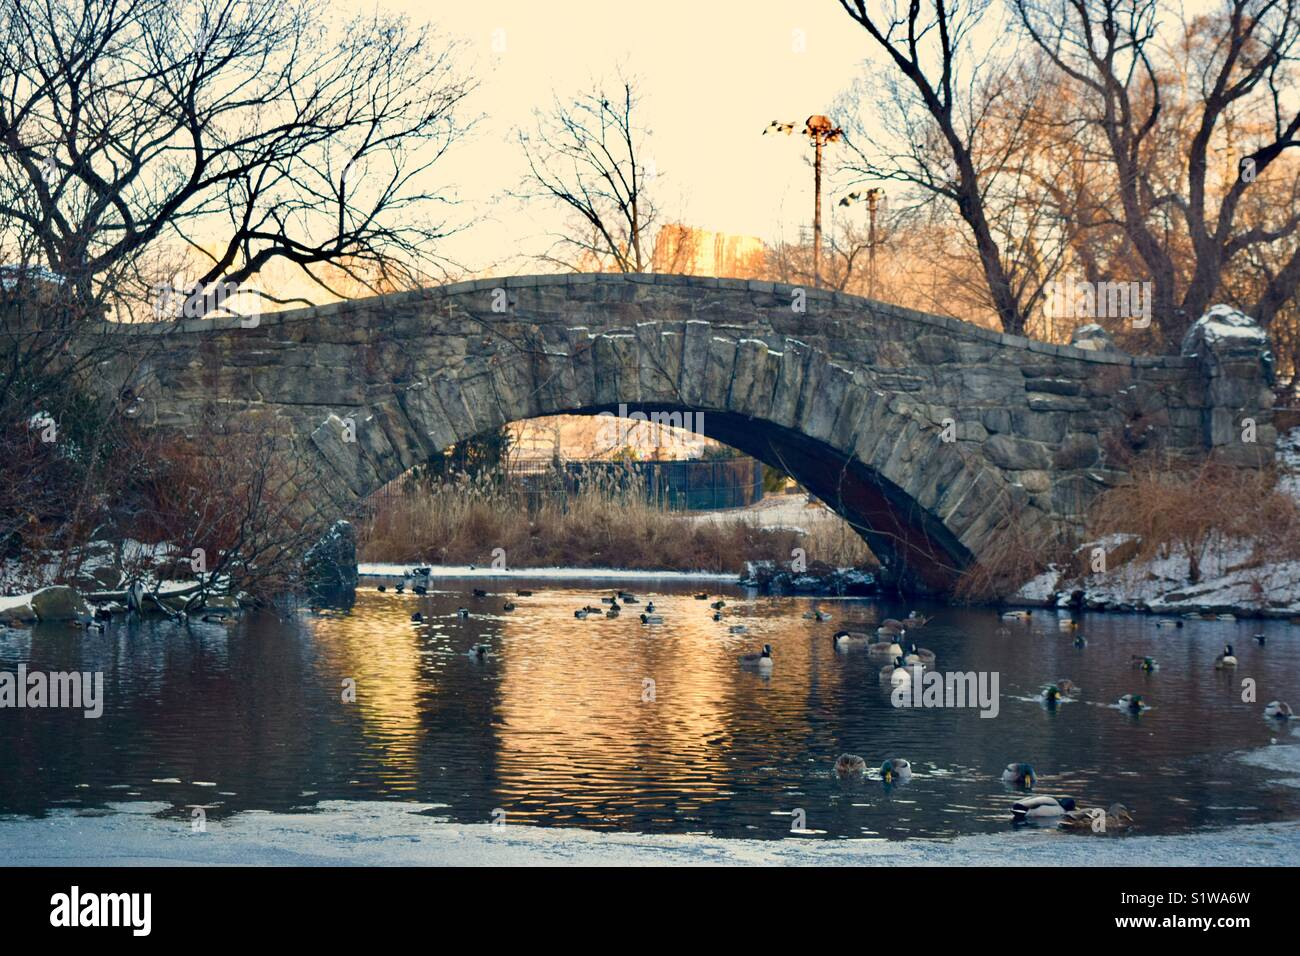 Gapstow Bridge - Stock Image